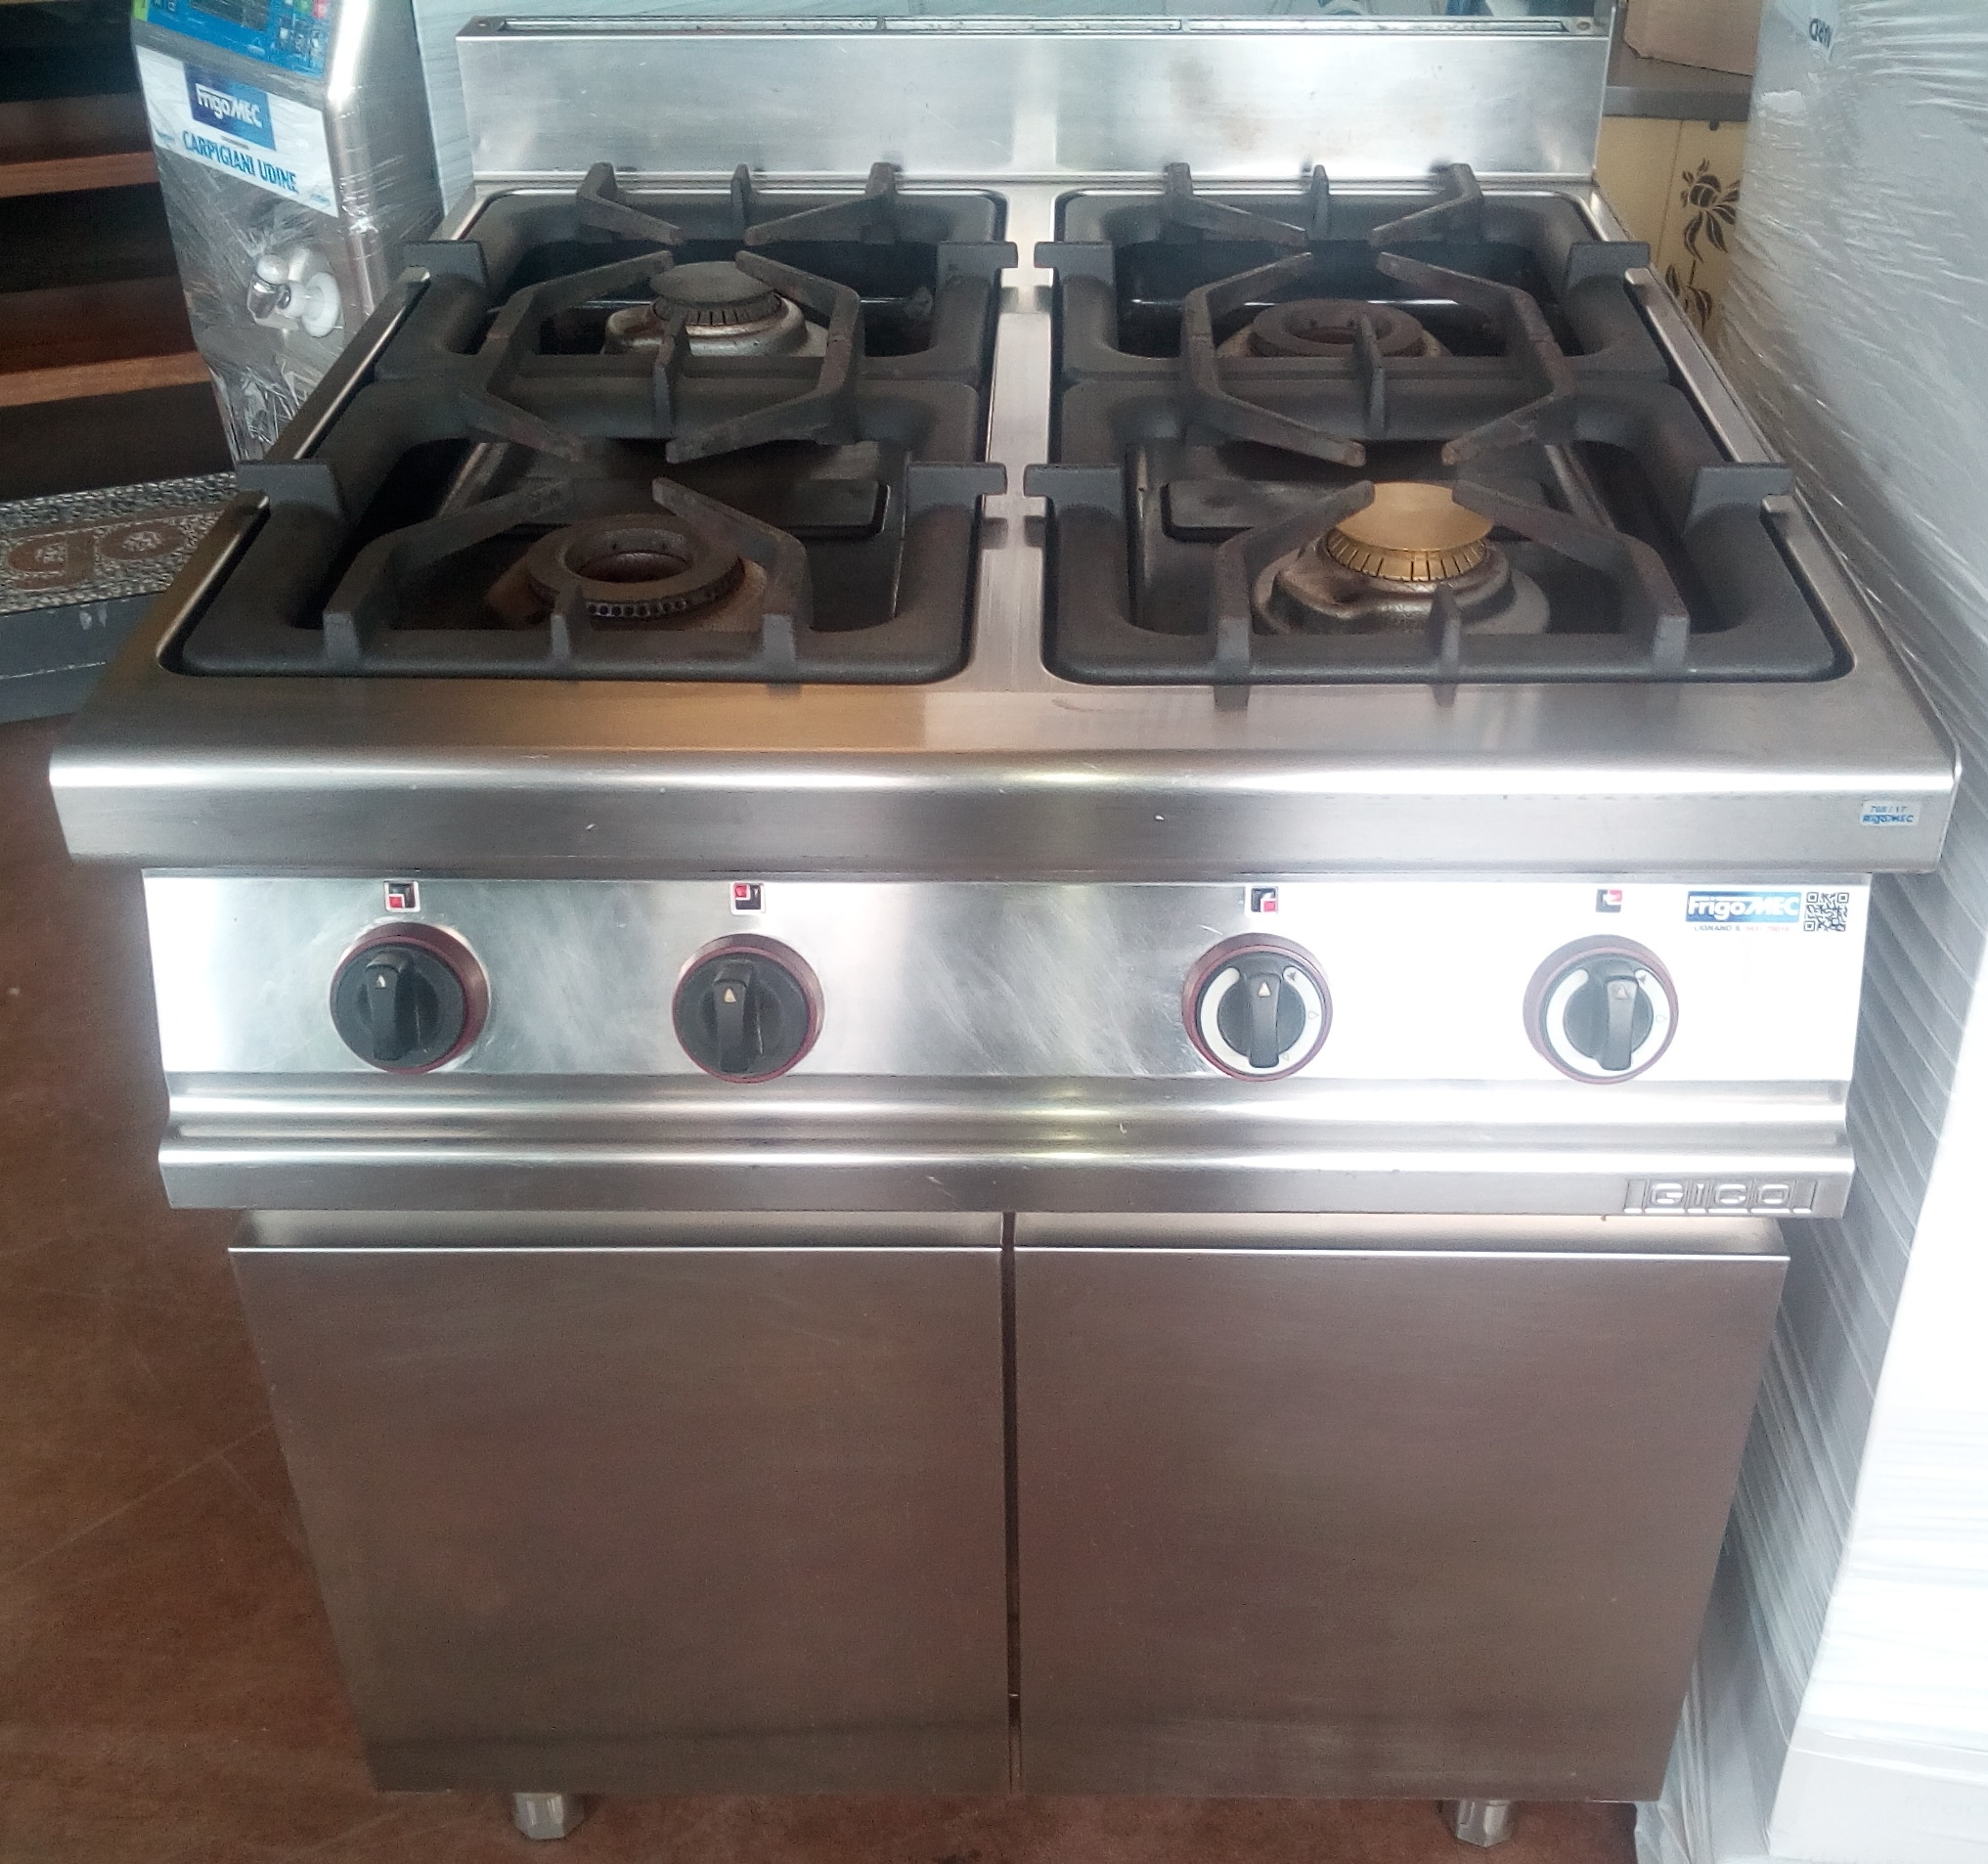 cucina4fuochi